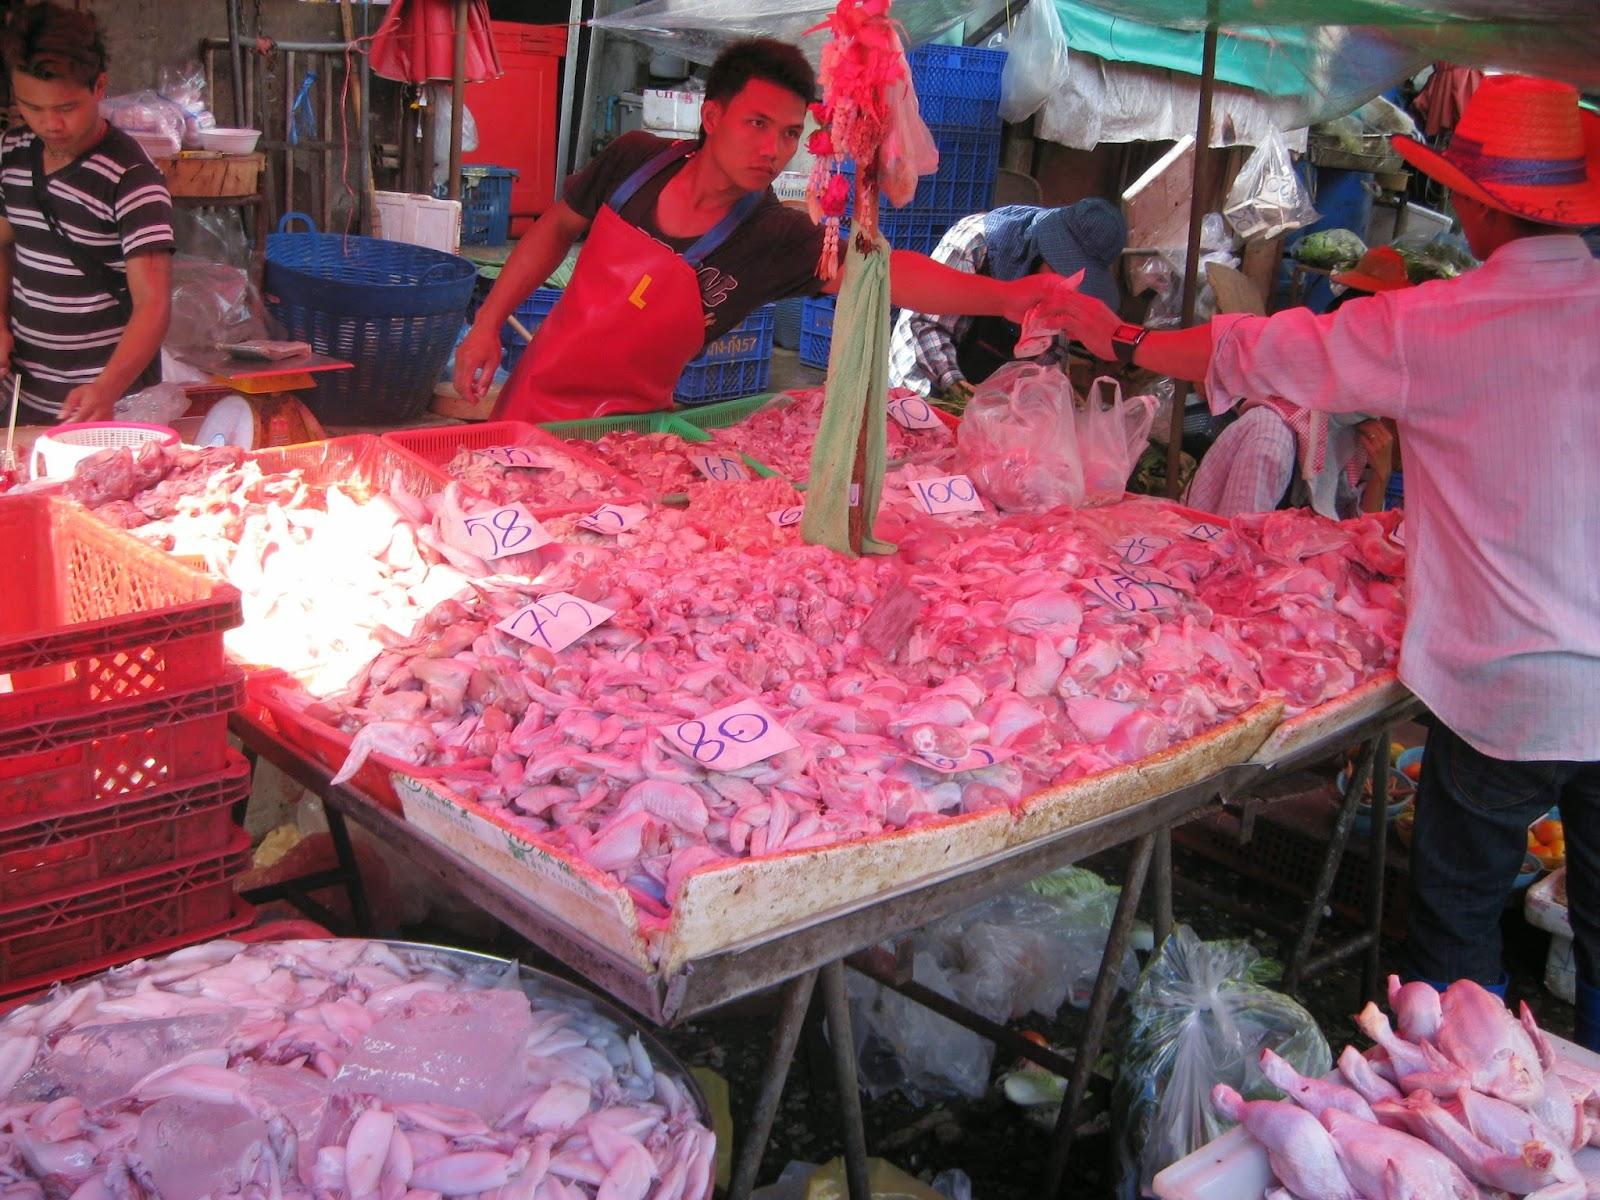 Bangkok - Wet market meat stalls